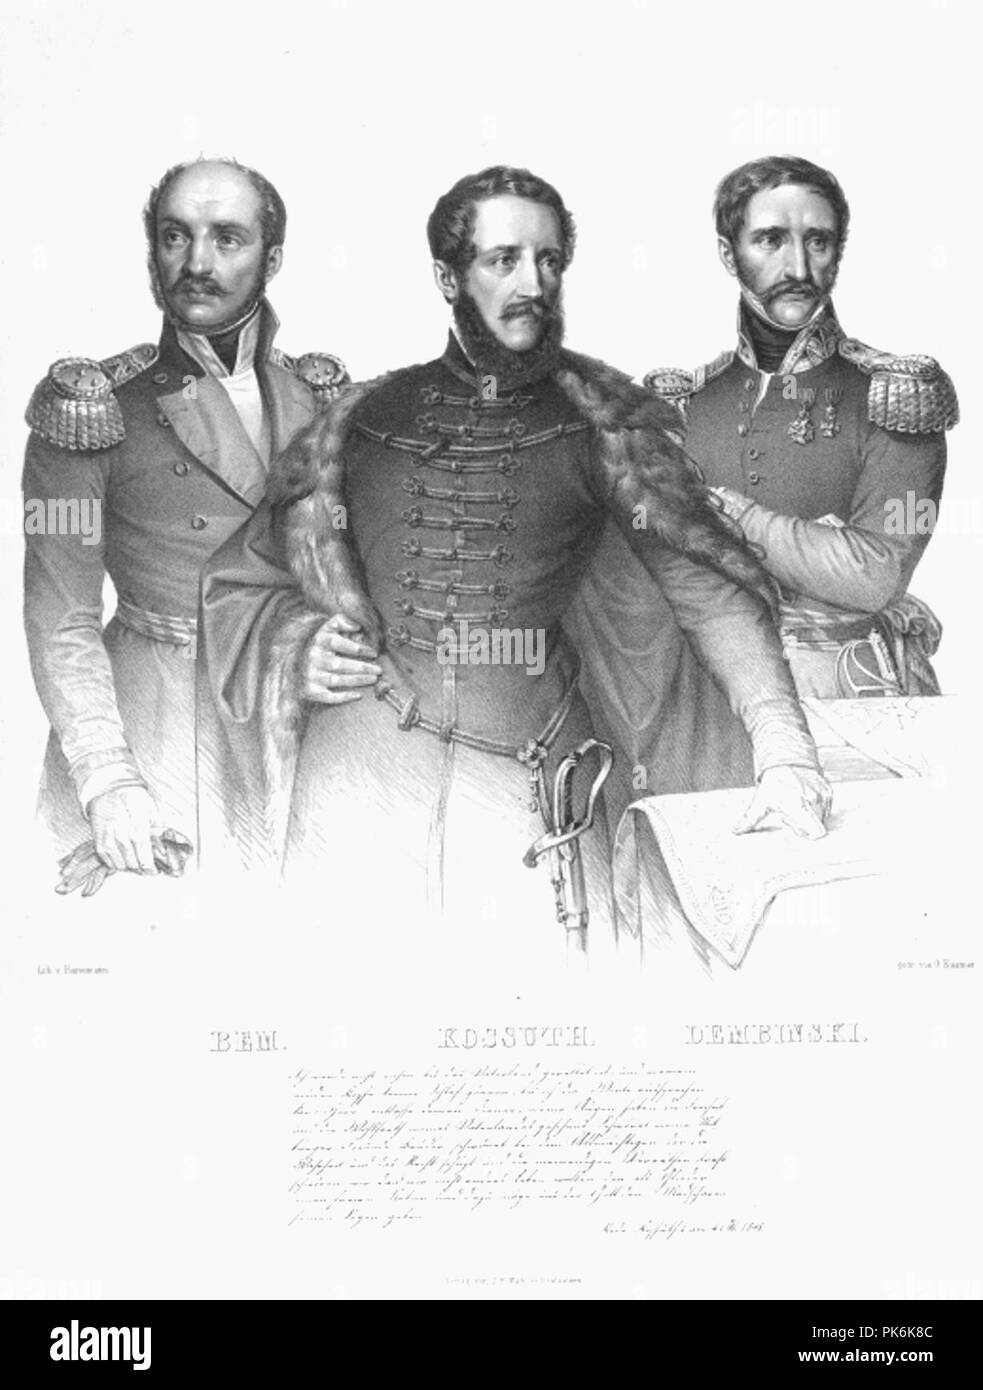 Bem - Kossuth - Dembinsky. - Stock Image